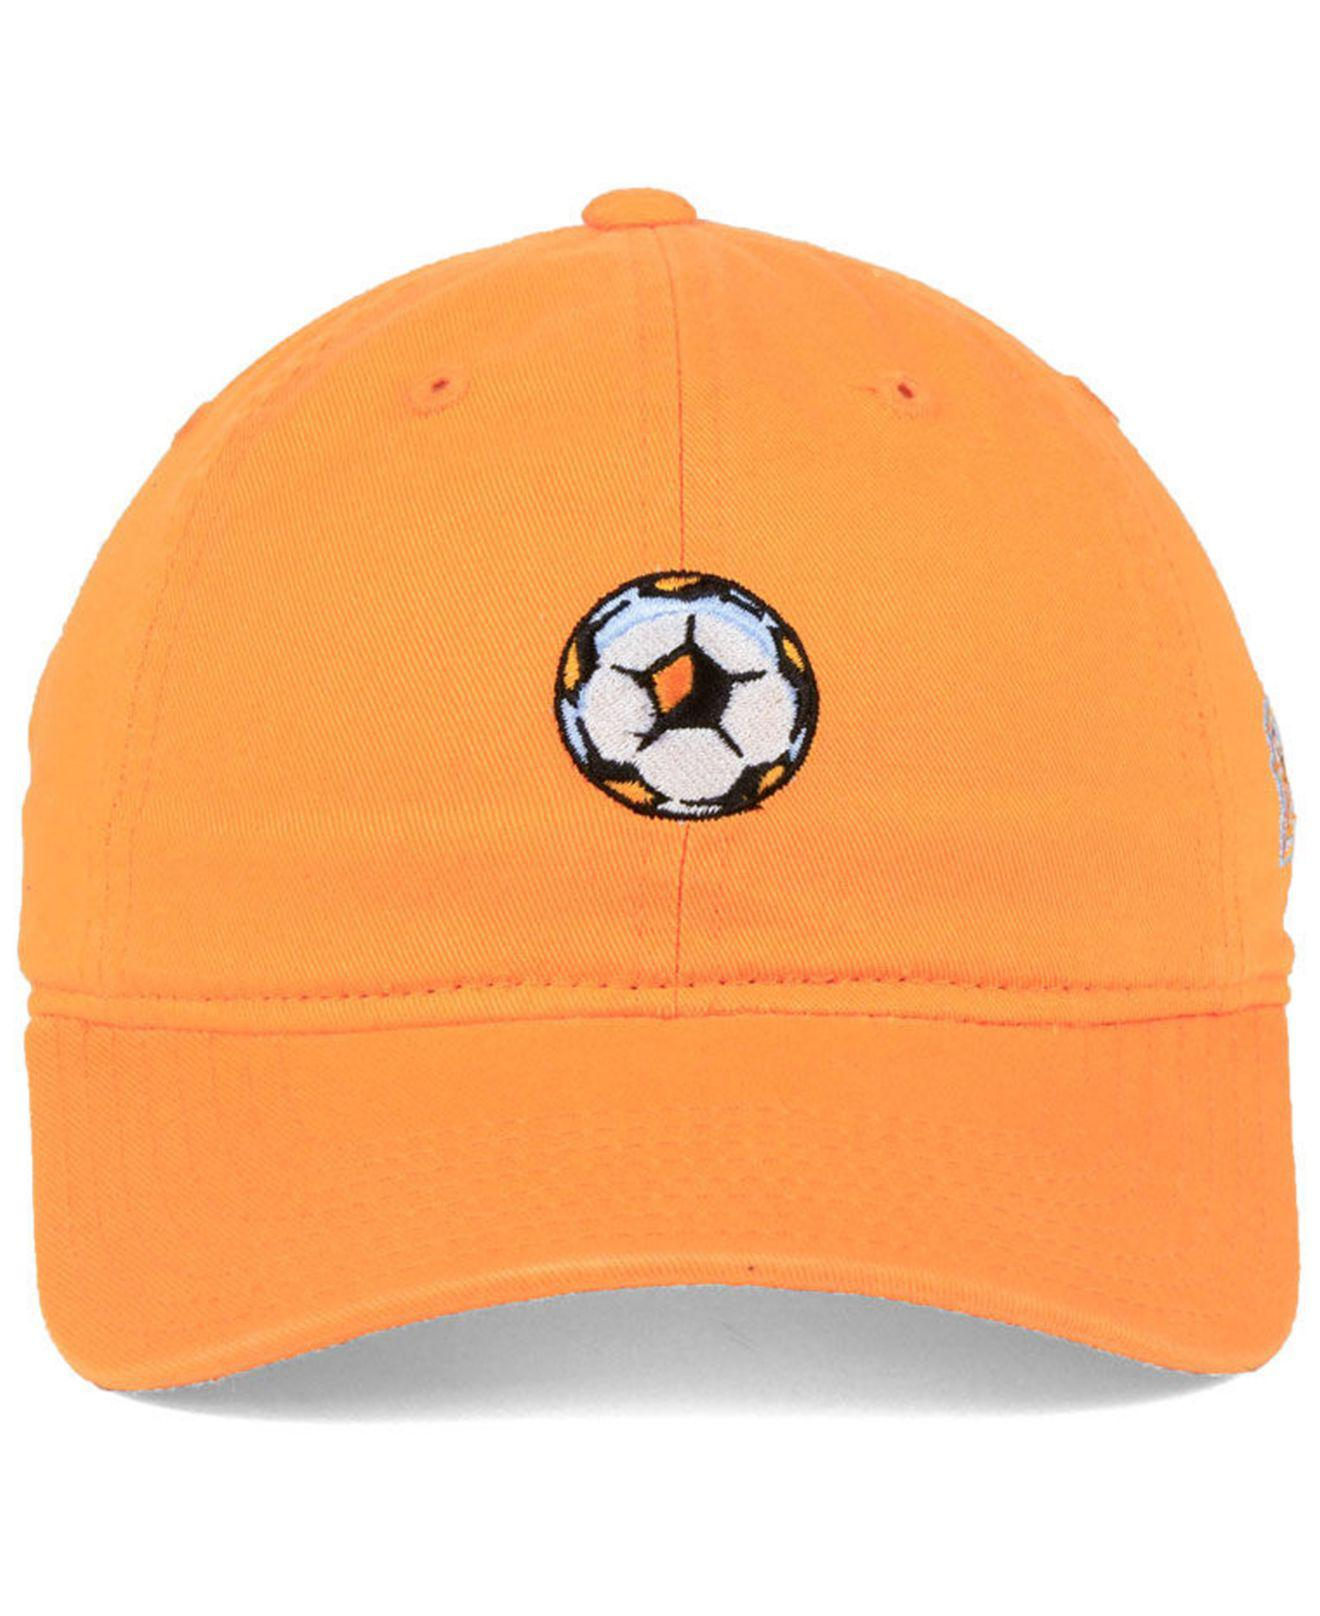 7efc1987fdf ... official store lyst adidas houston dynamo partial logo dad cap in orange  for men e70f3 731c2